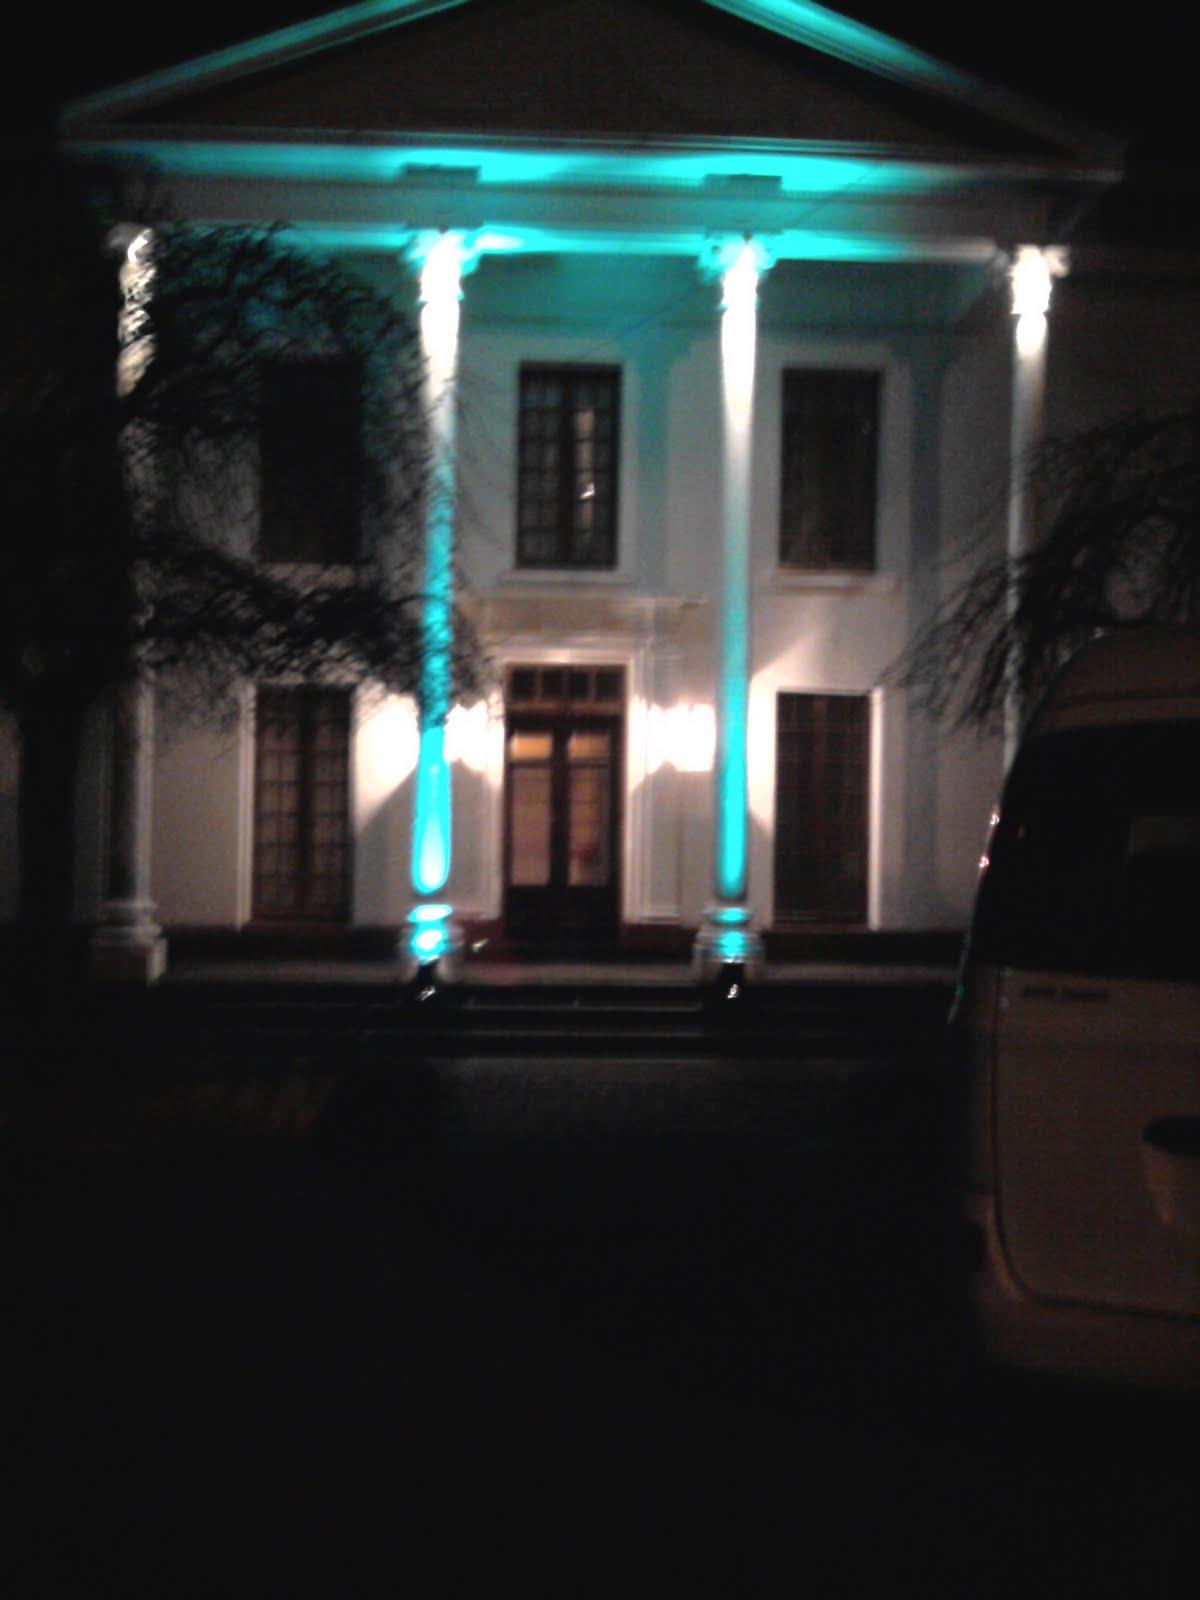 Cf audio e iluminacion decoraci n fachadas - Decoracion iluminacion ...